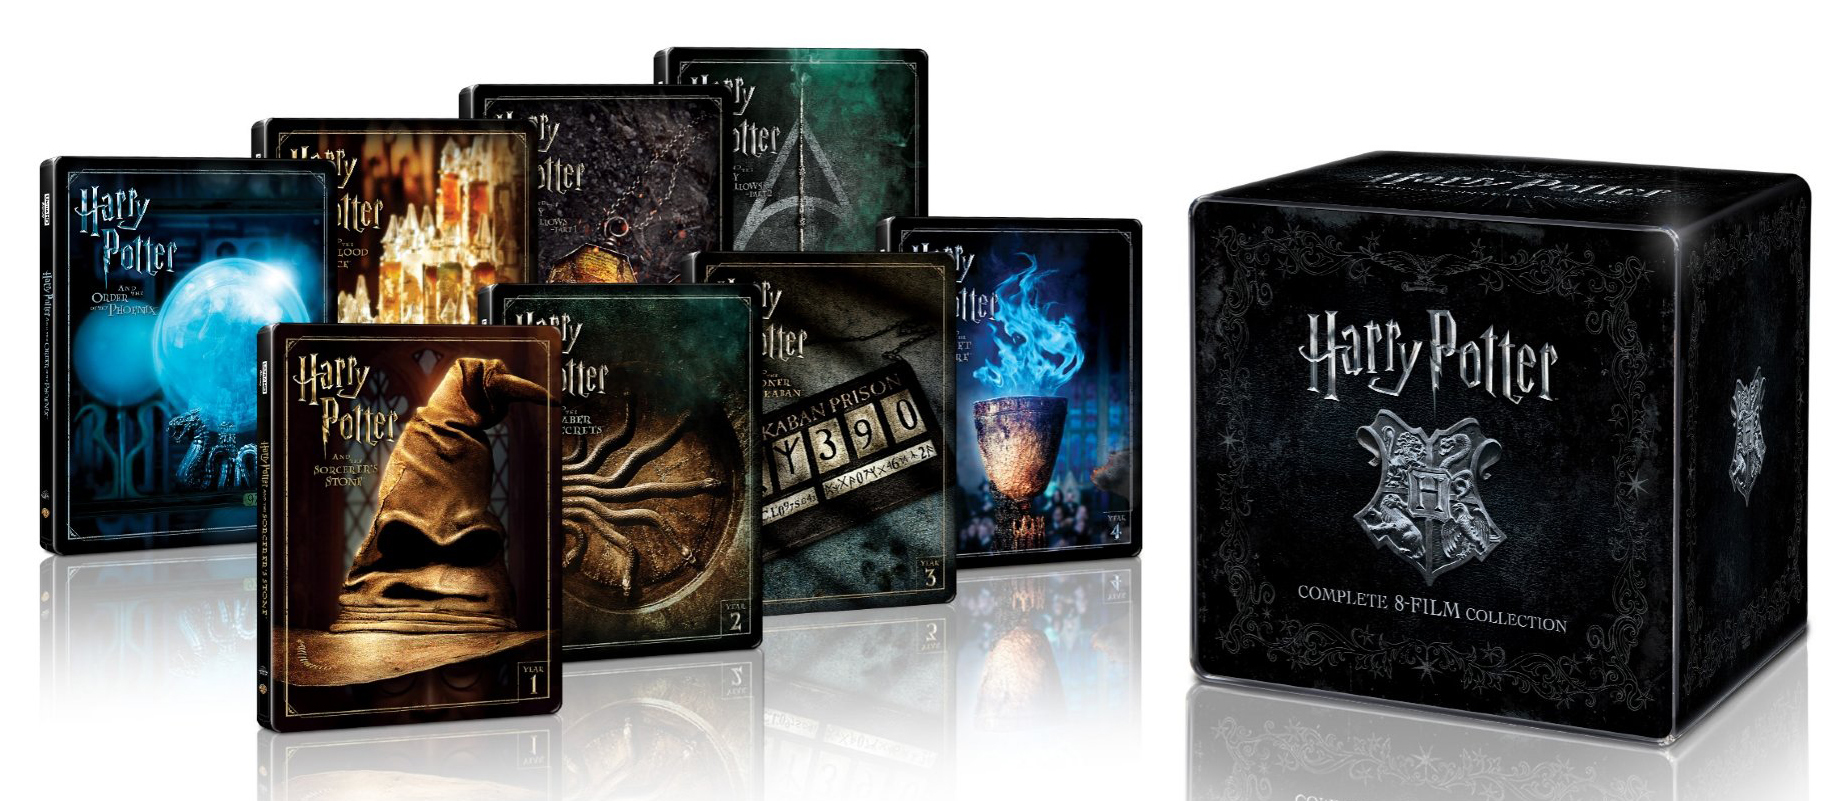 Harry Potter: 8-Film Collection 4K (SteelBook) UHD Ultra HD Blu-ray